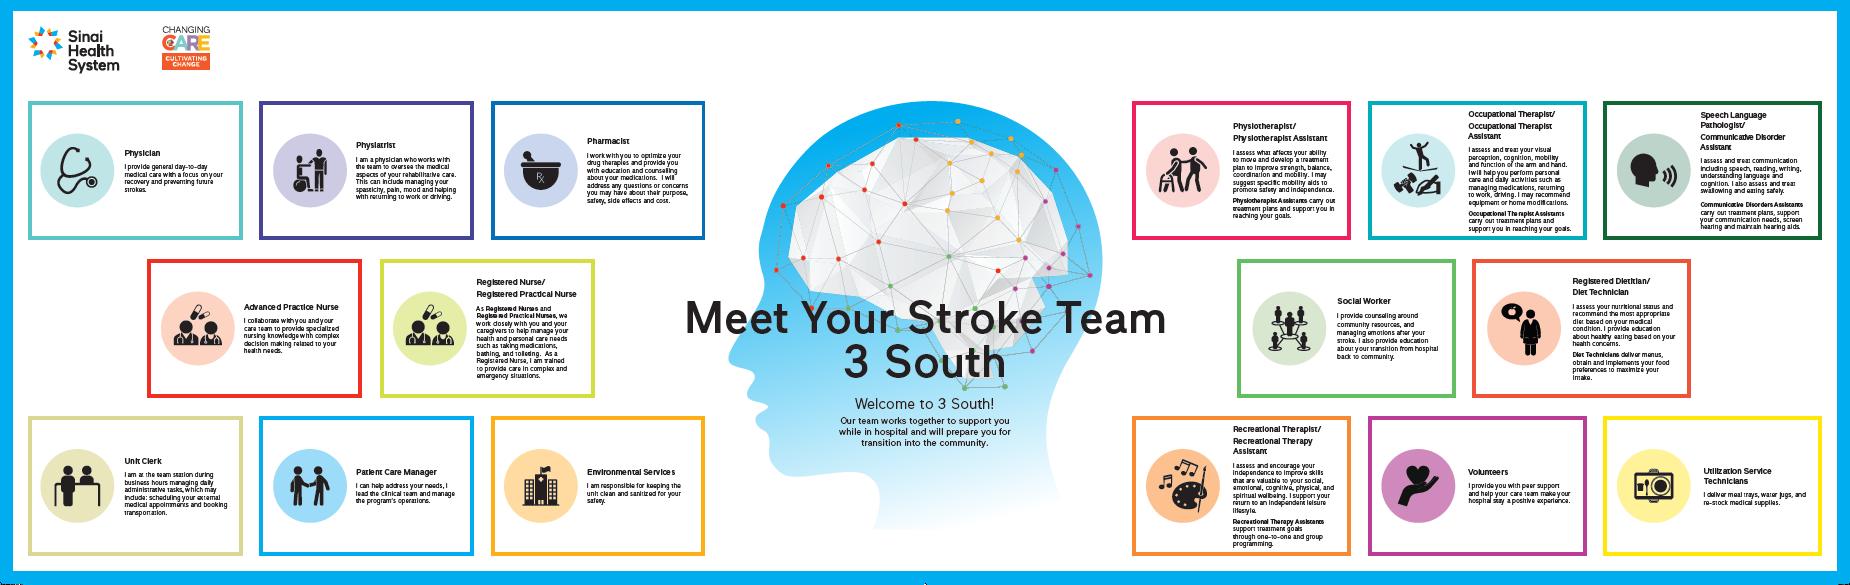 stroke-team-description-wall